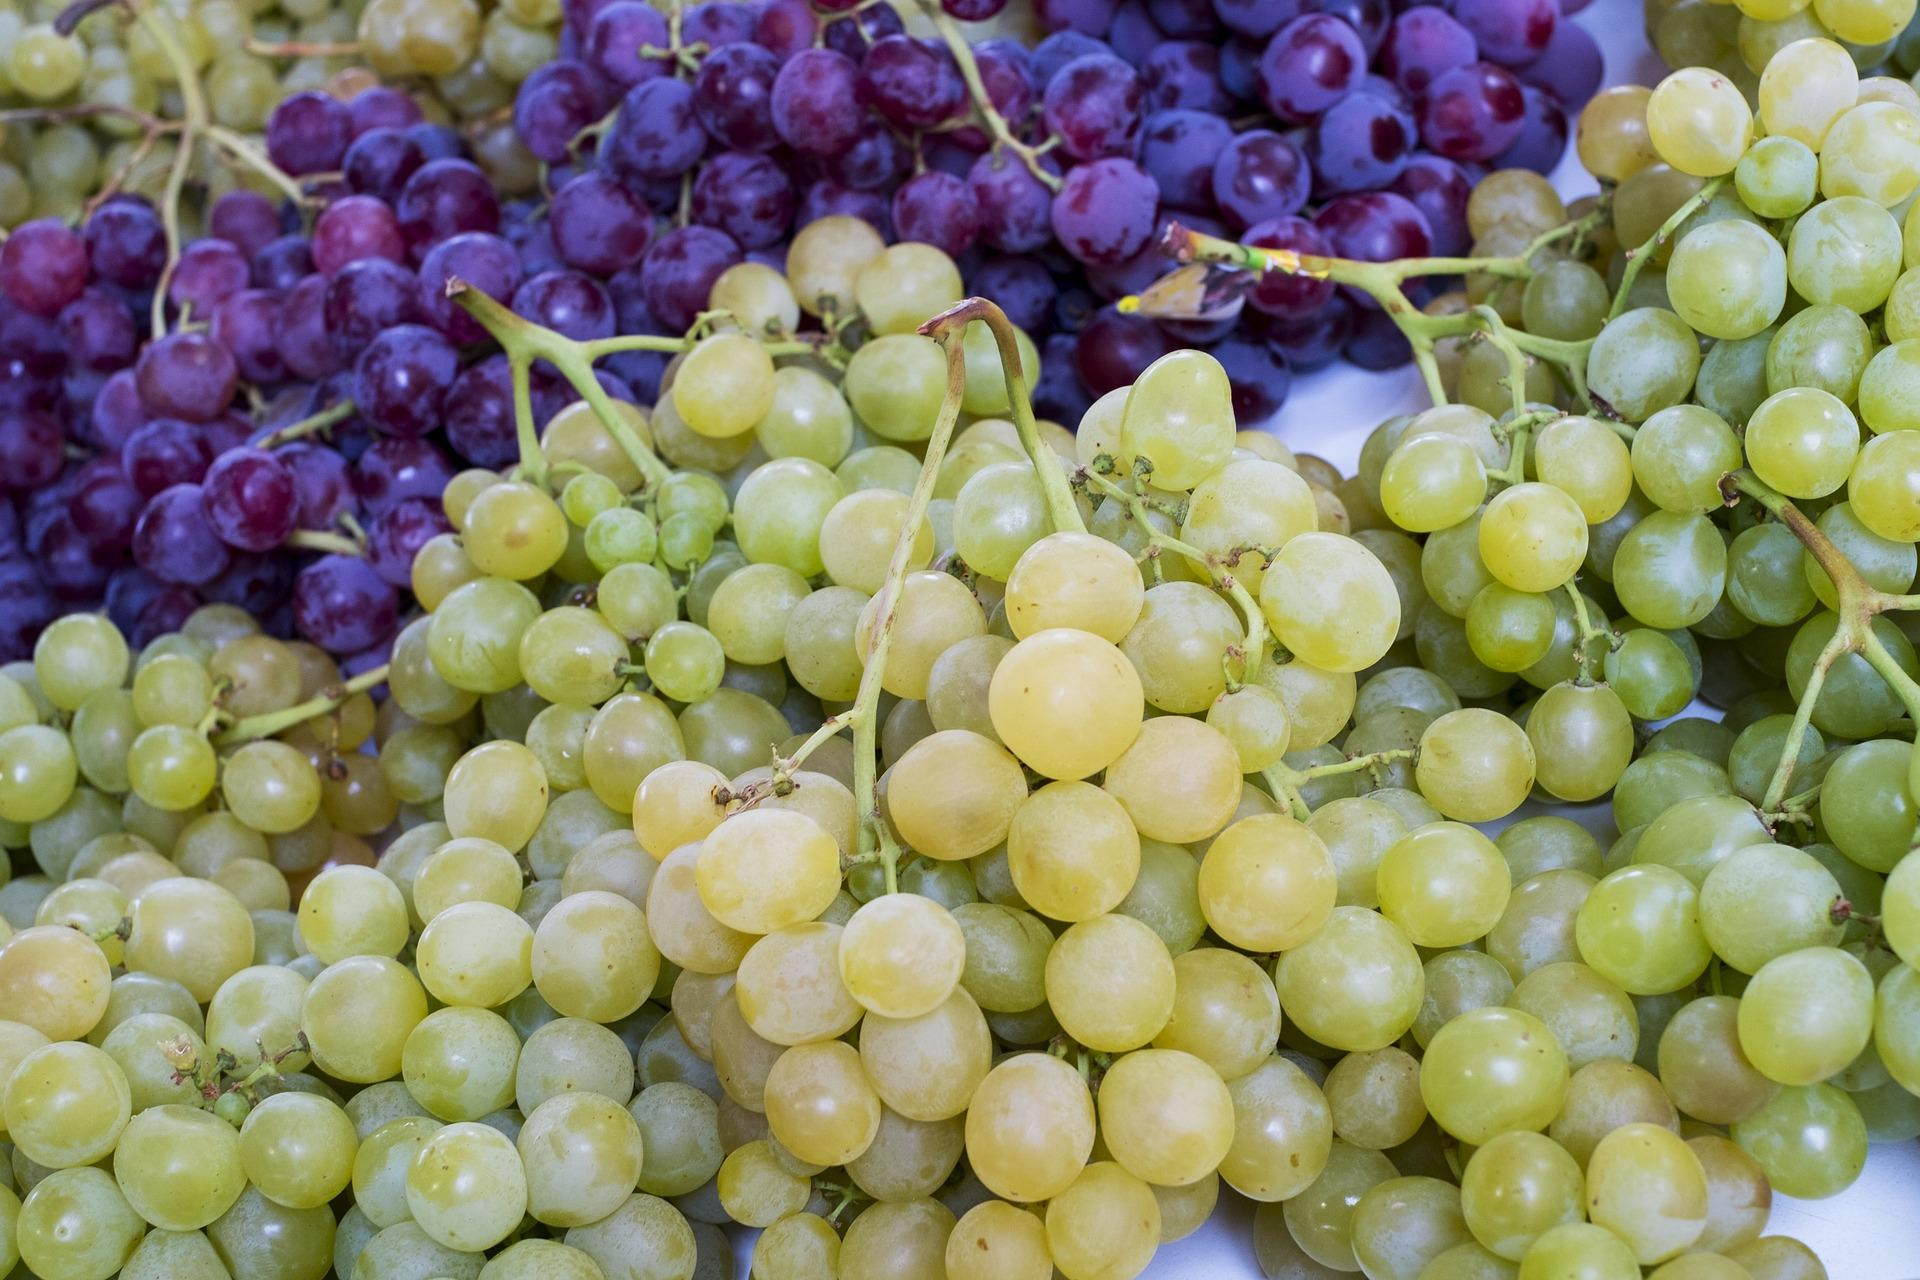 grapes-1143027_1920